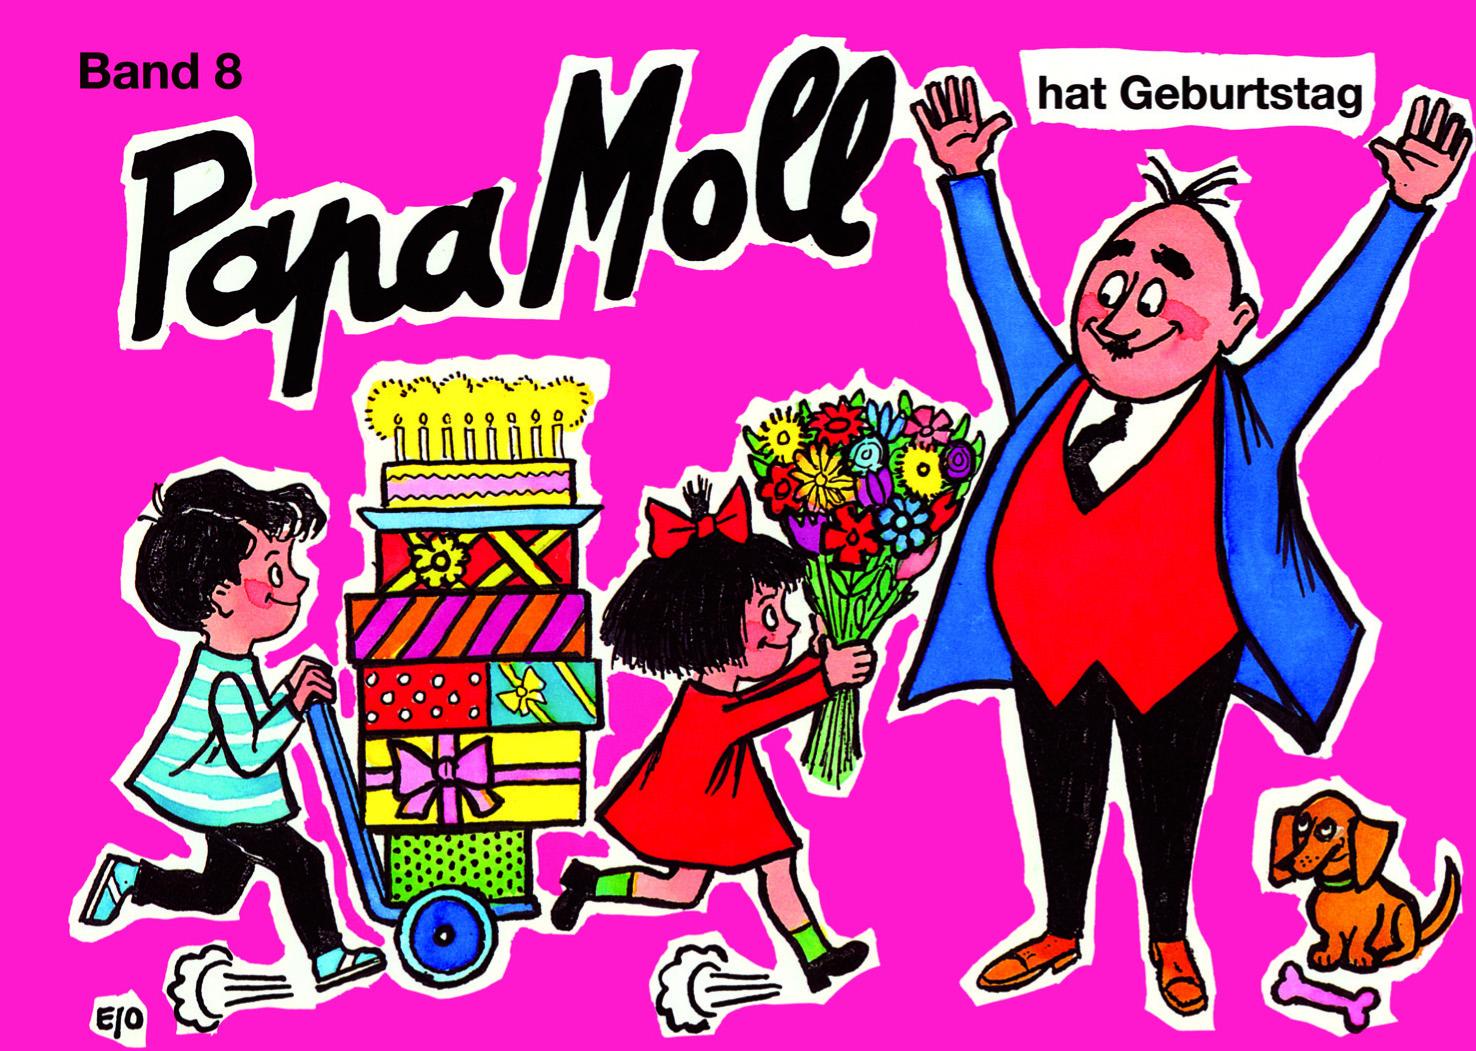 Papa Moll Hat Geburtstag Orell Fussli Verlag